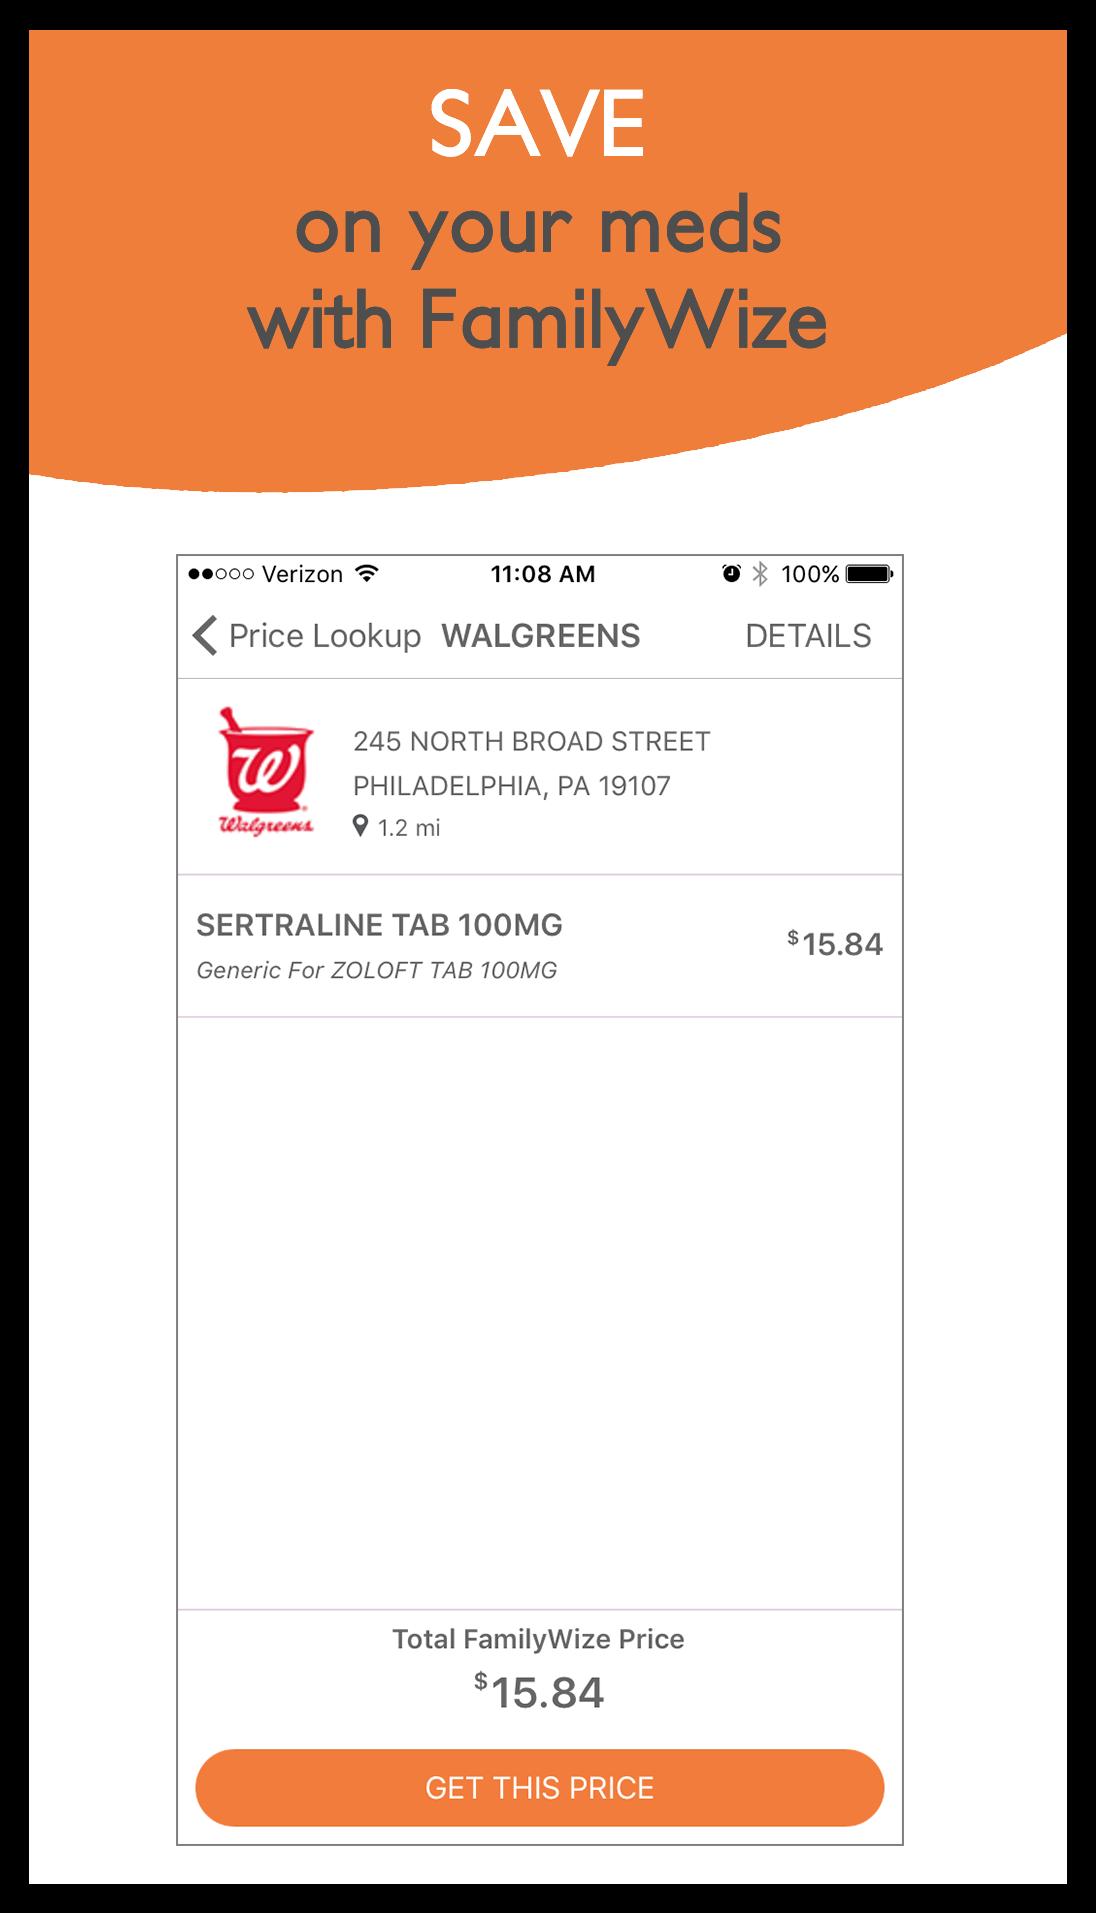 Pharmacy Details Screen